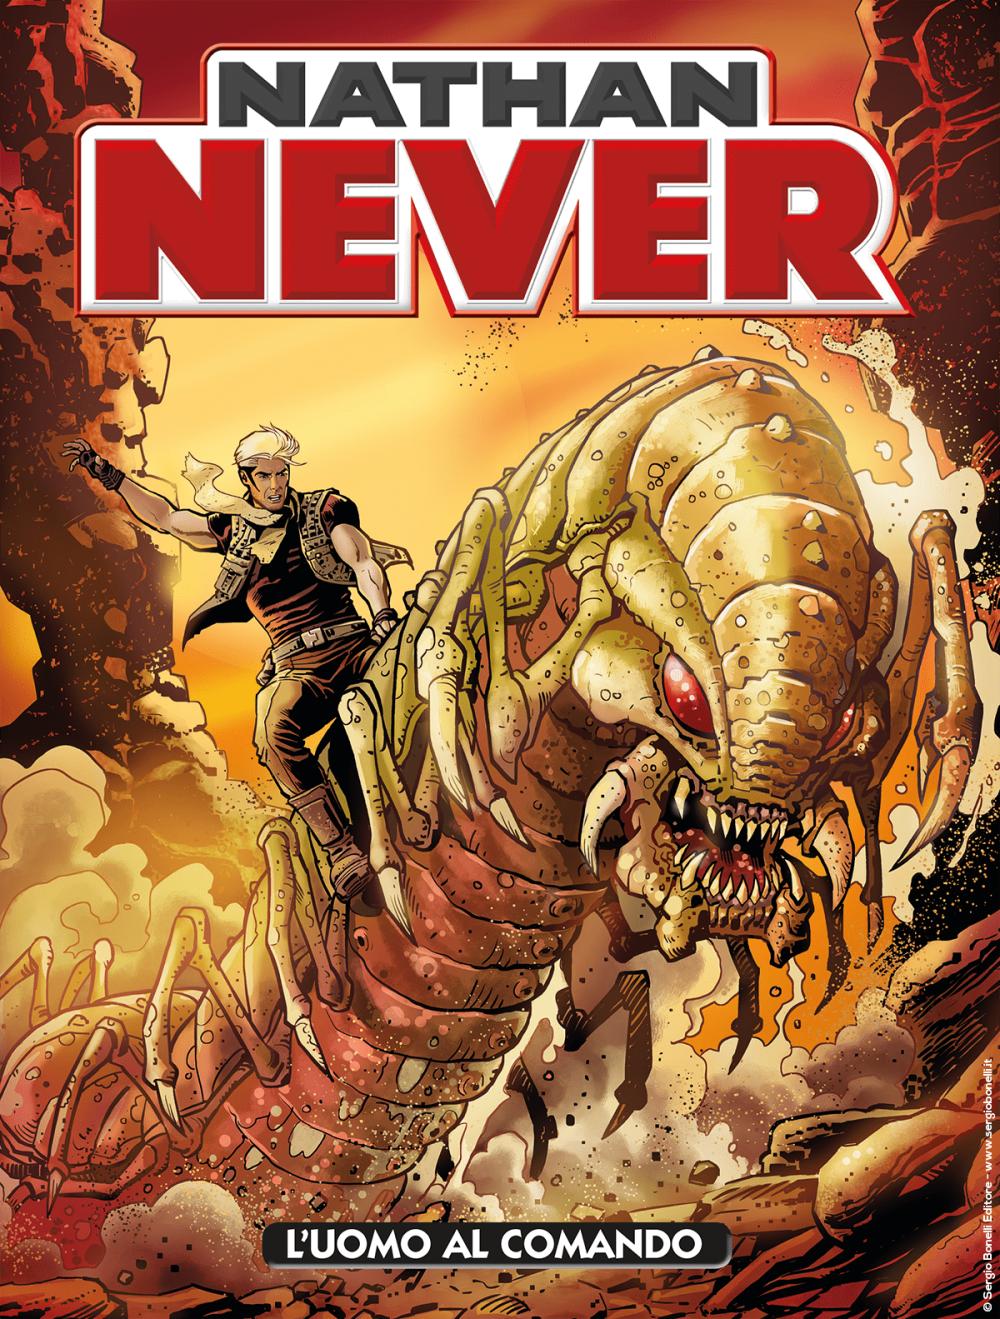 Nathan Never n. 342: L'uomo al comando